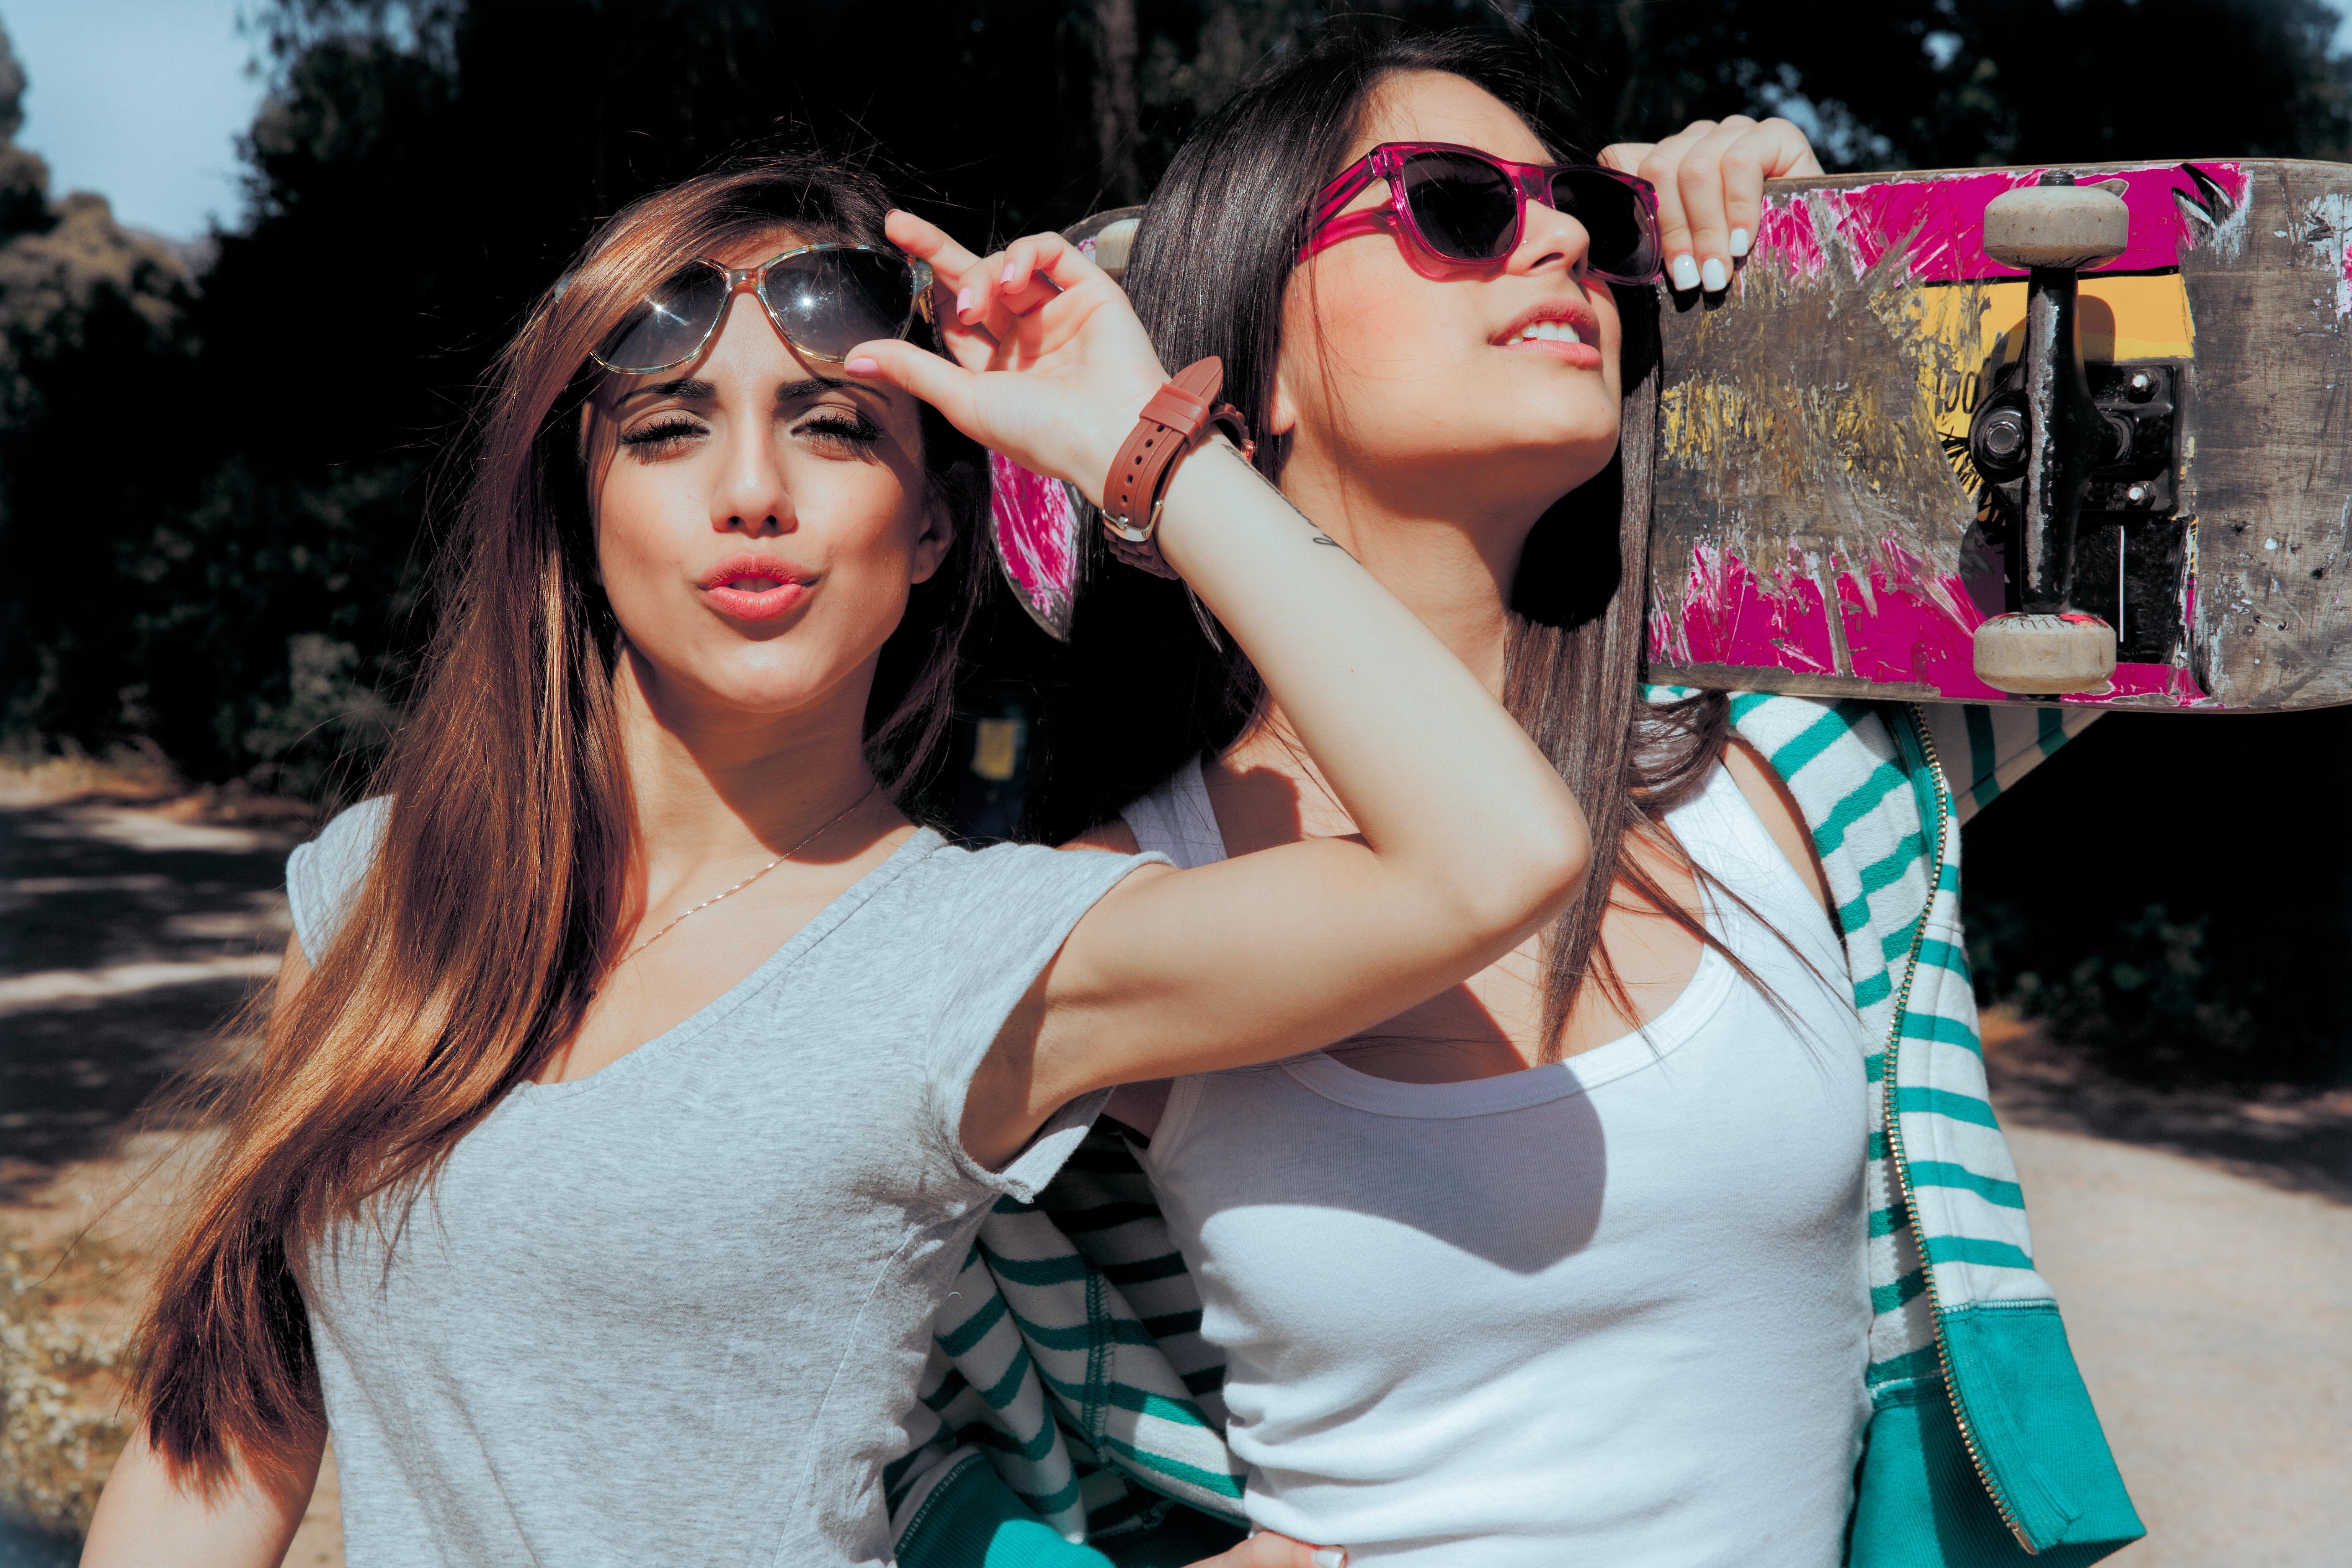 Фото двух девушек брюнеток 21 фотография